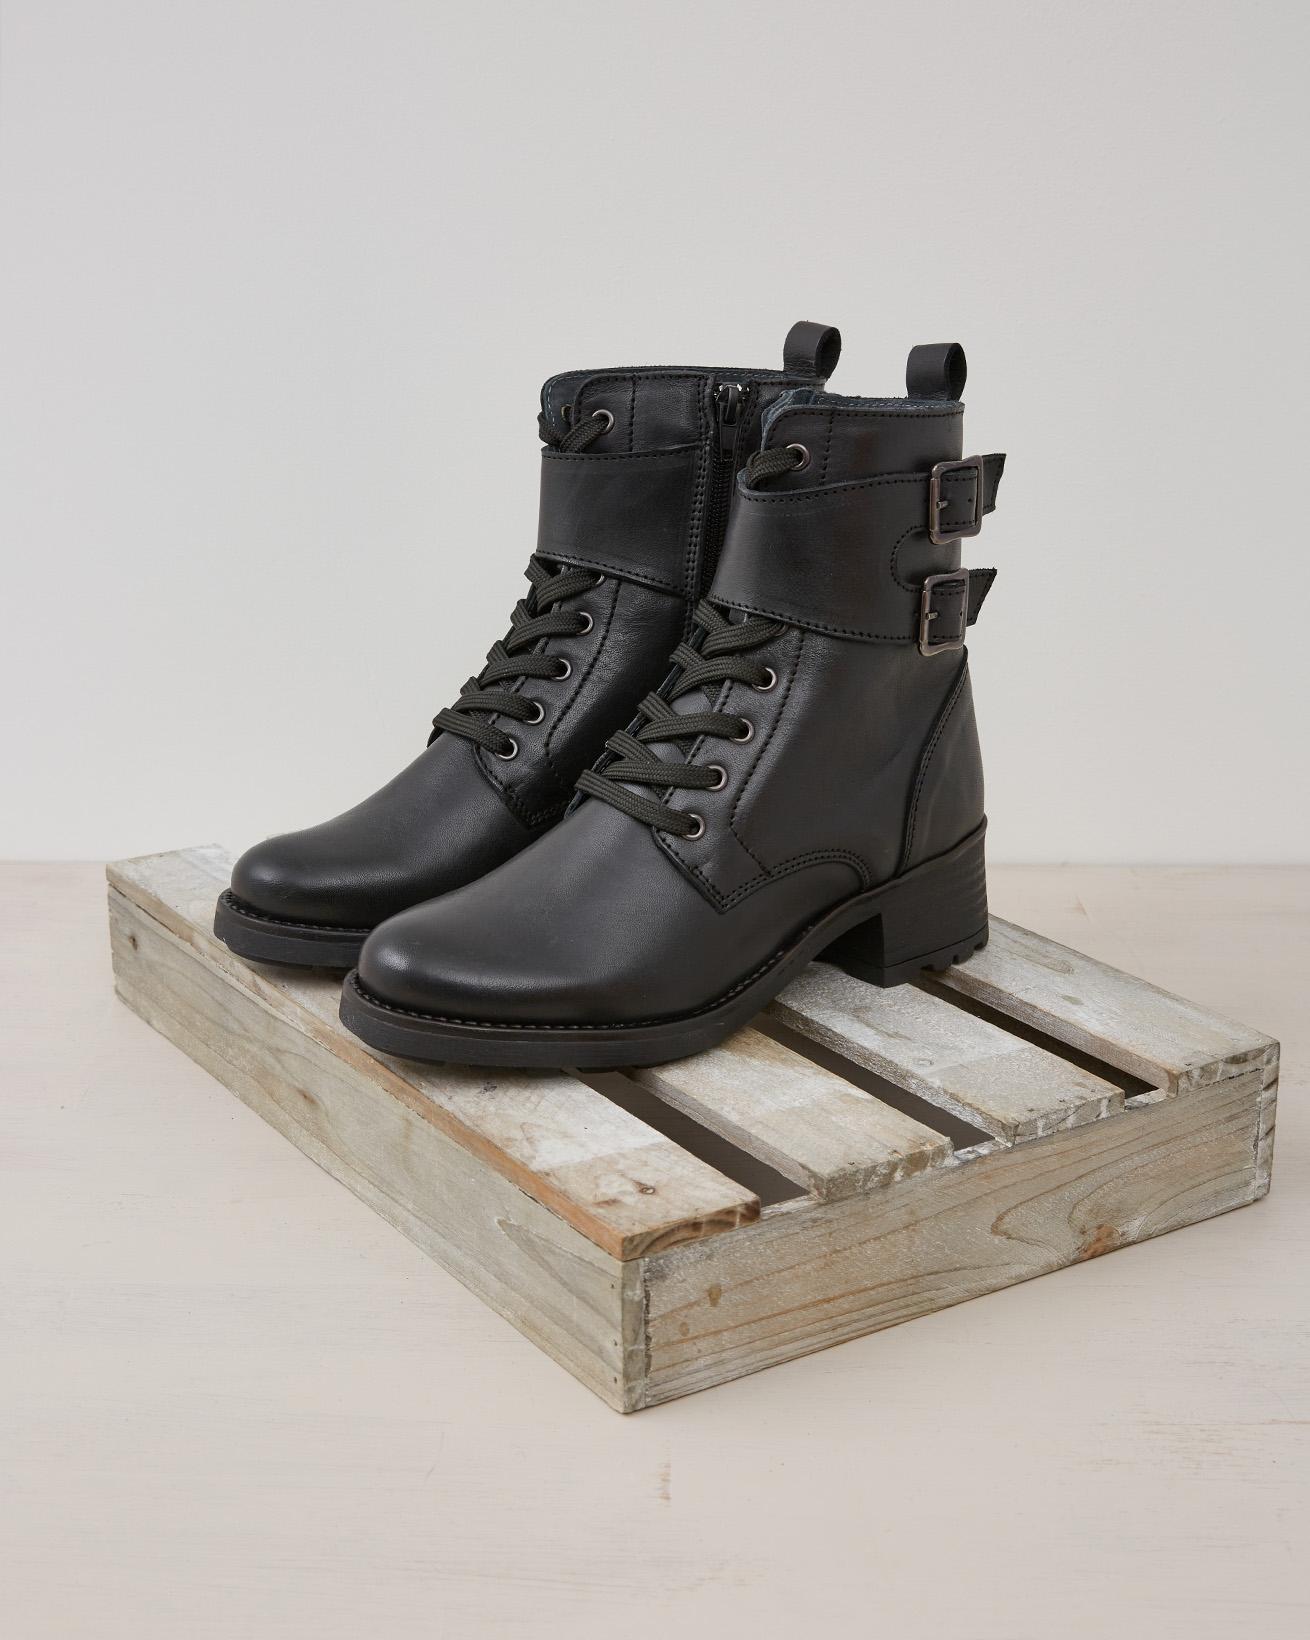 Veg Tanned Combat Boot - Black - Size 37 - 2445